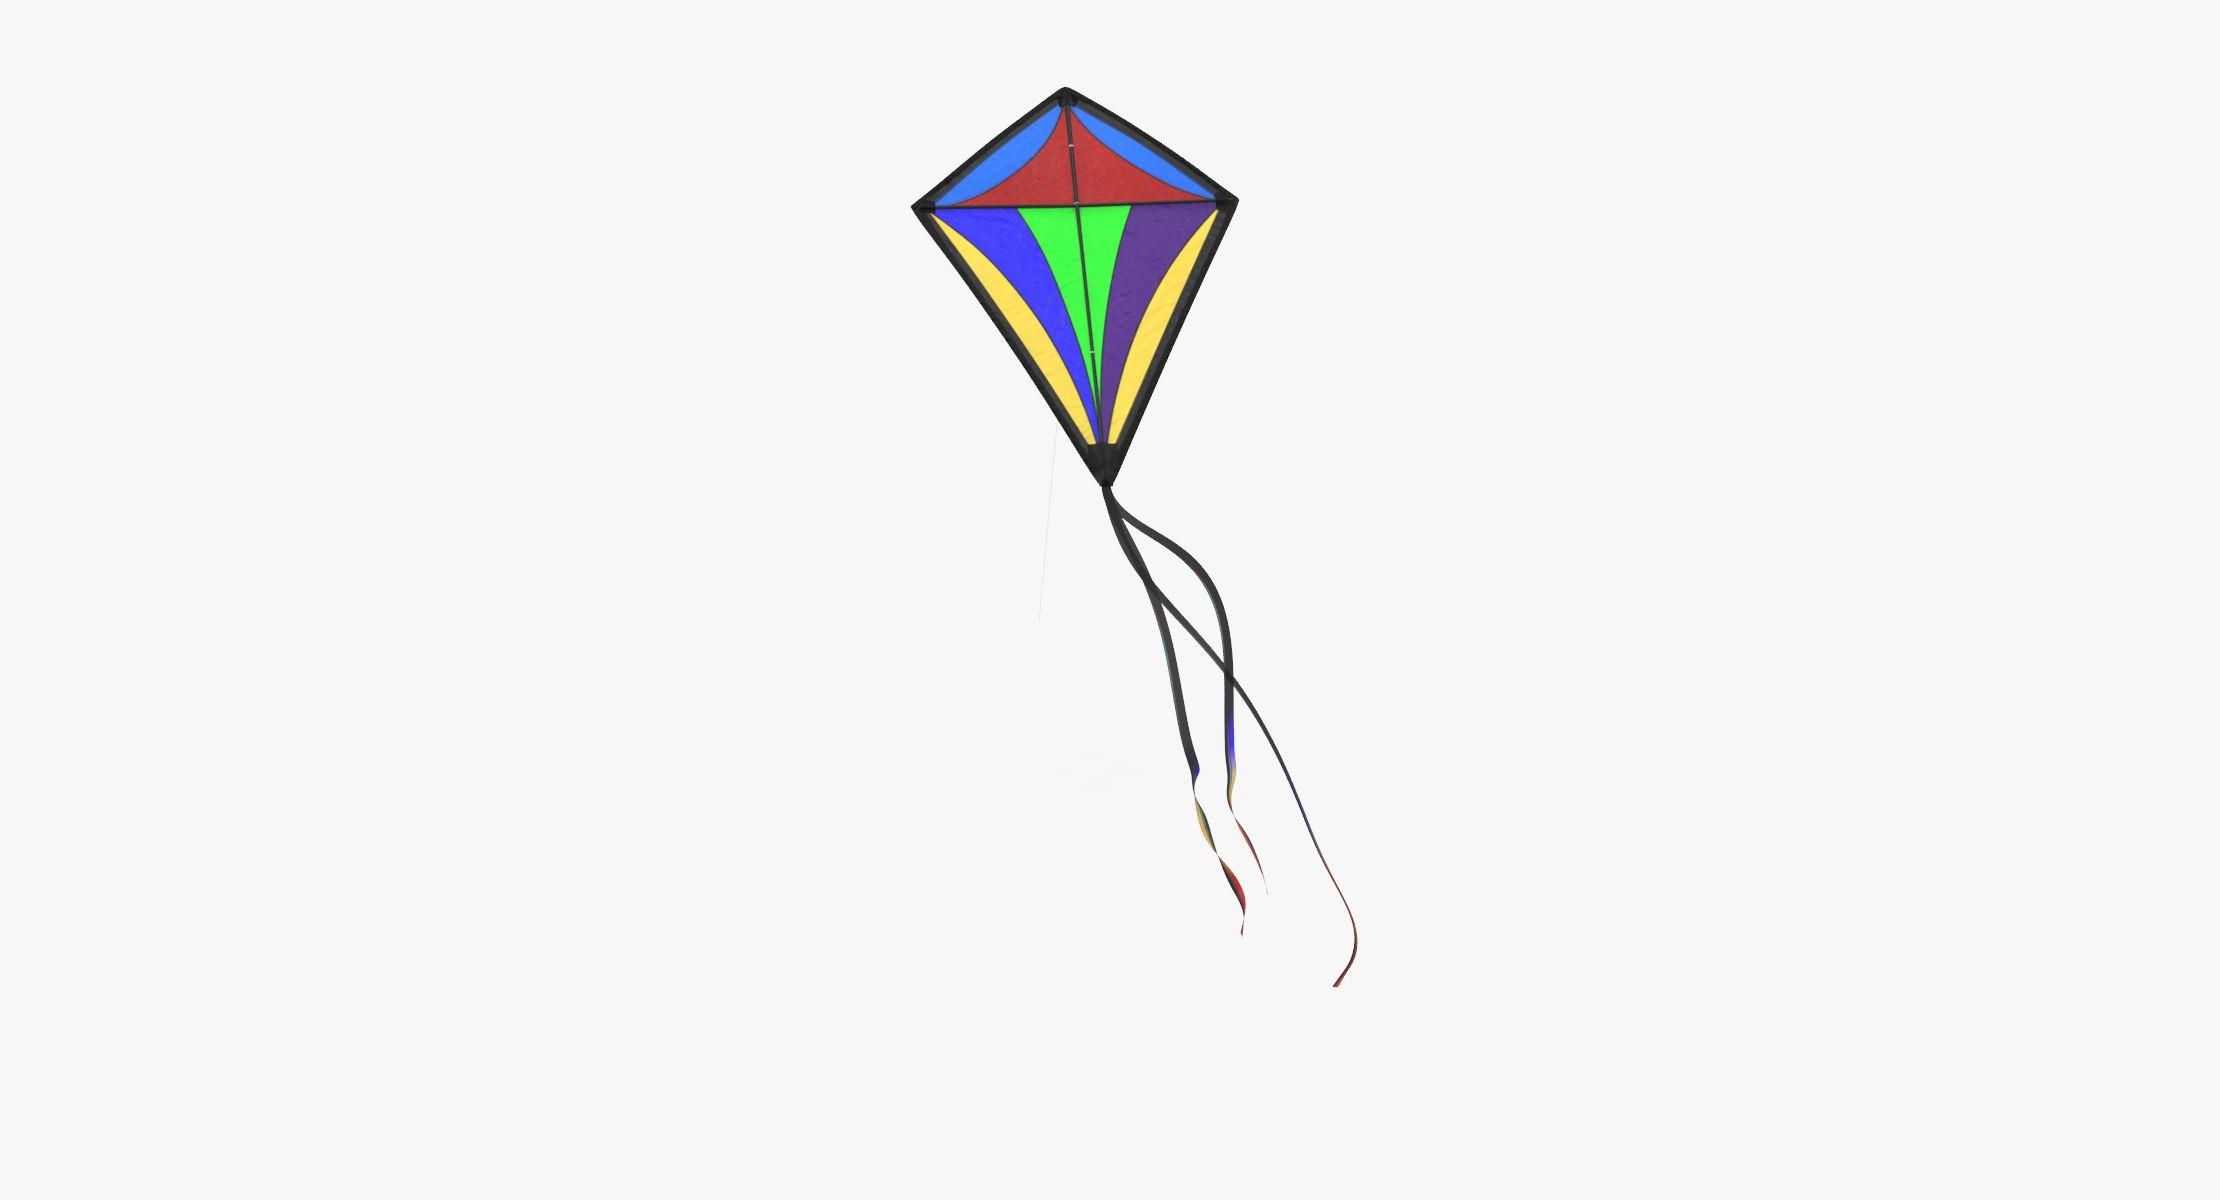 Kite 02 - reel 1